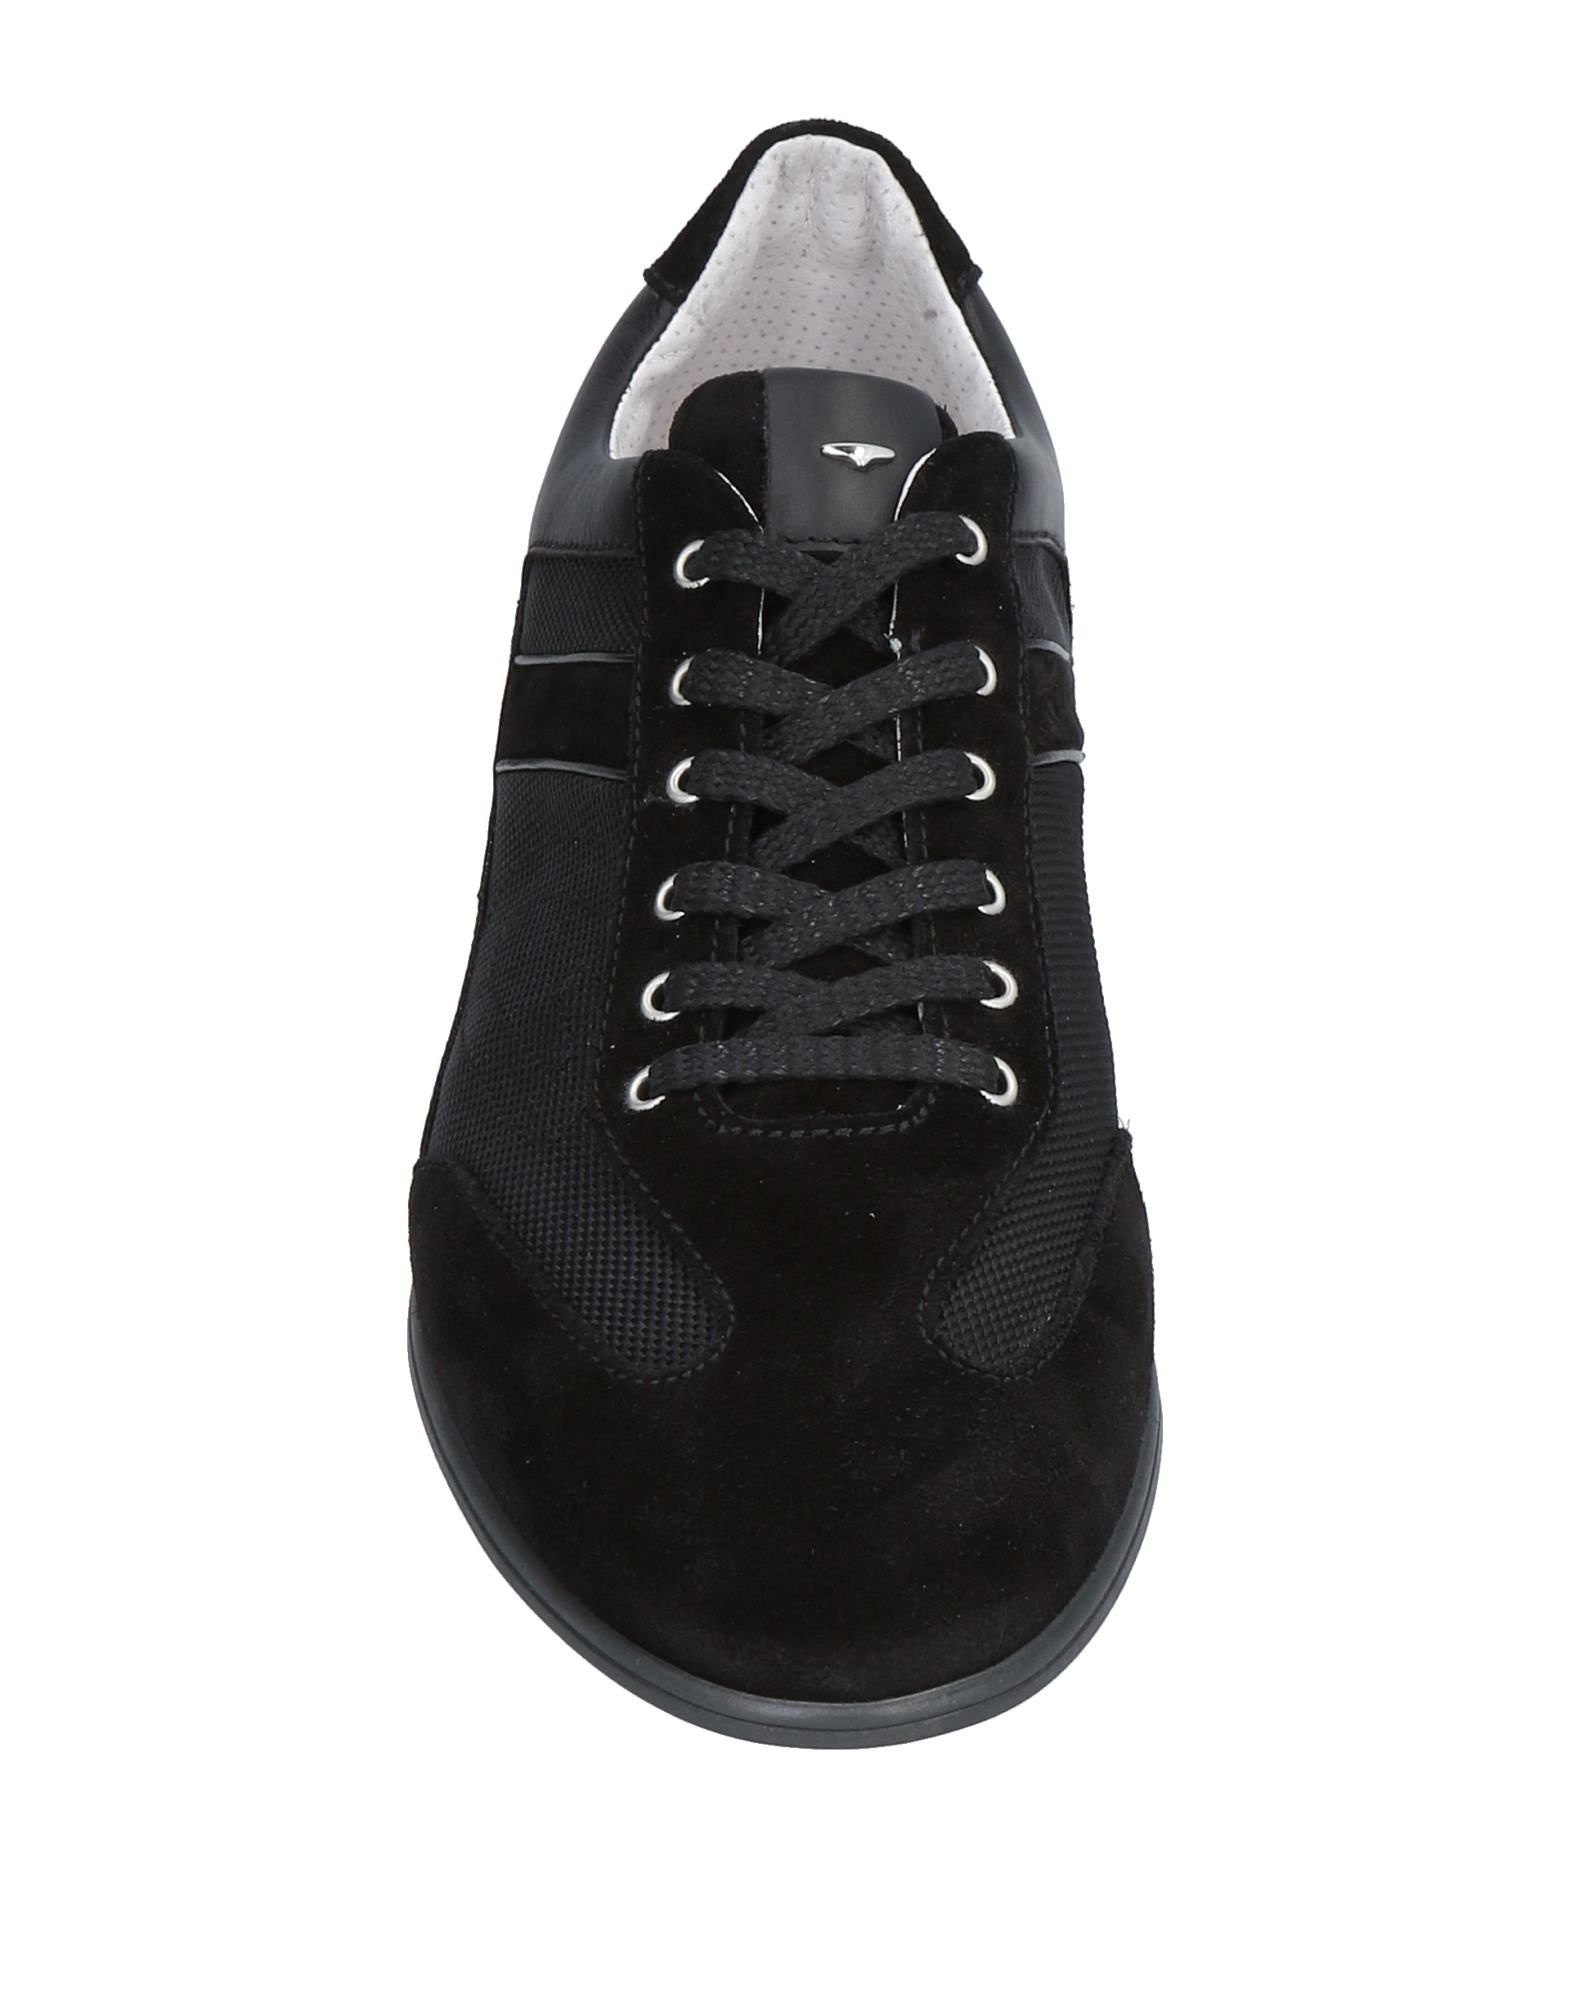 Pantanetti Schnürschuhe Herren  11474455XV Schuhe Heiße Schuhe 11474455XV f5edff